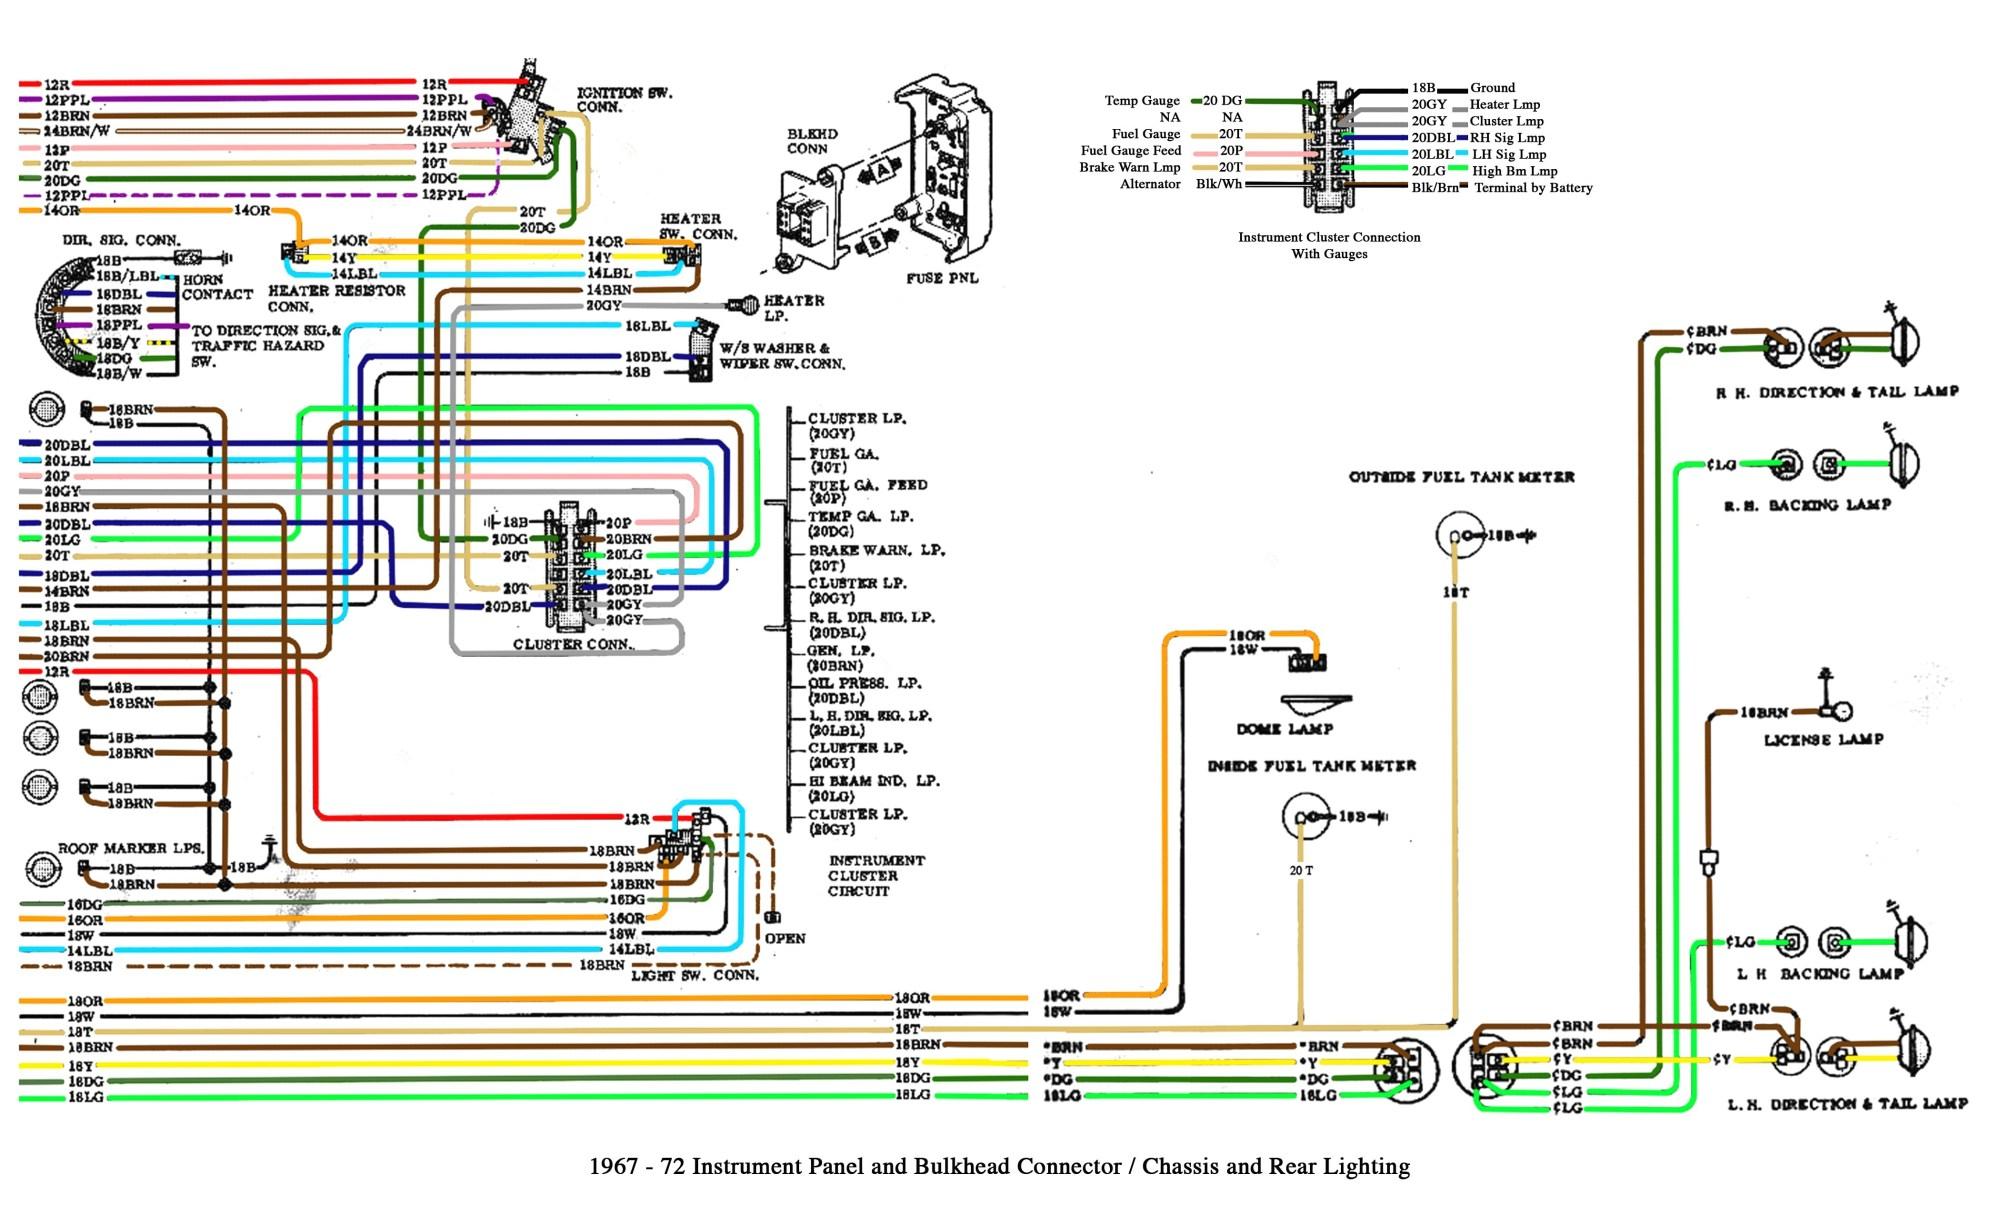 hight resolution of 2000 chevy silverado on 2001 chevrolet silverado engine diagram 2000chevysilveradoenginediagram 2001 chevrolet silverado 3500 2000 chevy